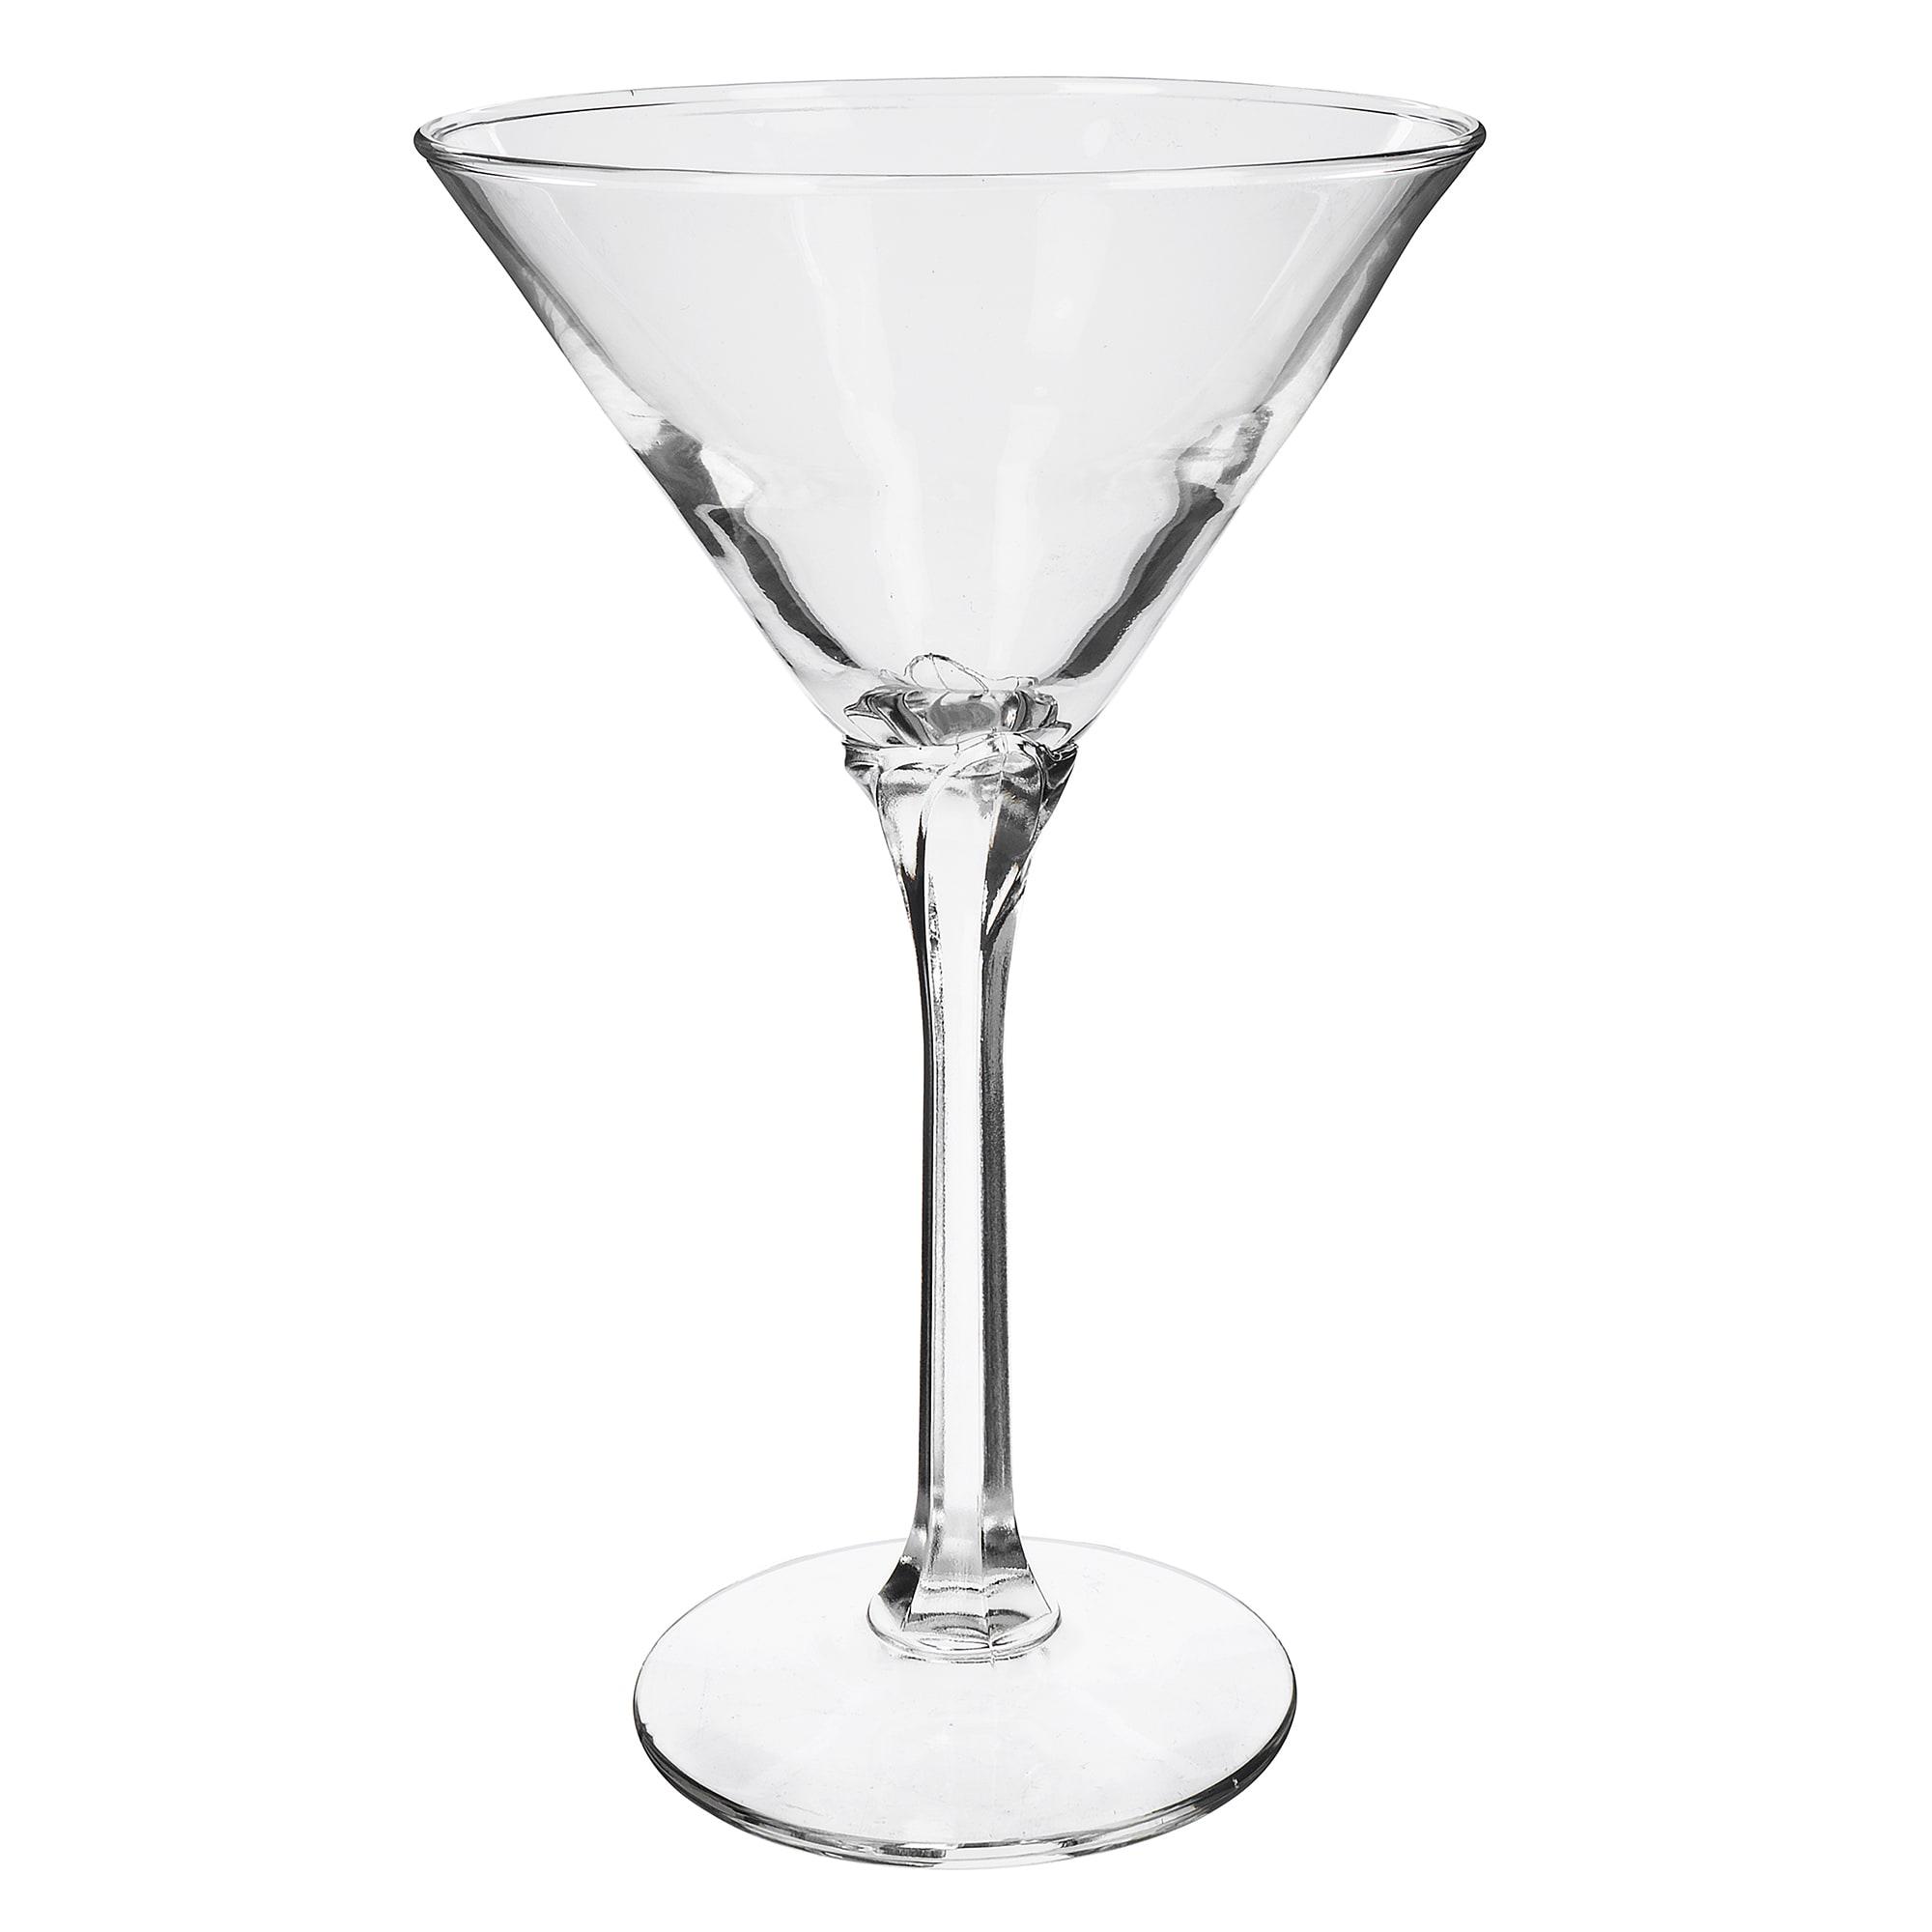 Libbey 8978 8-oz Domaine Martini Glass - Safedge Rim Guarantee